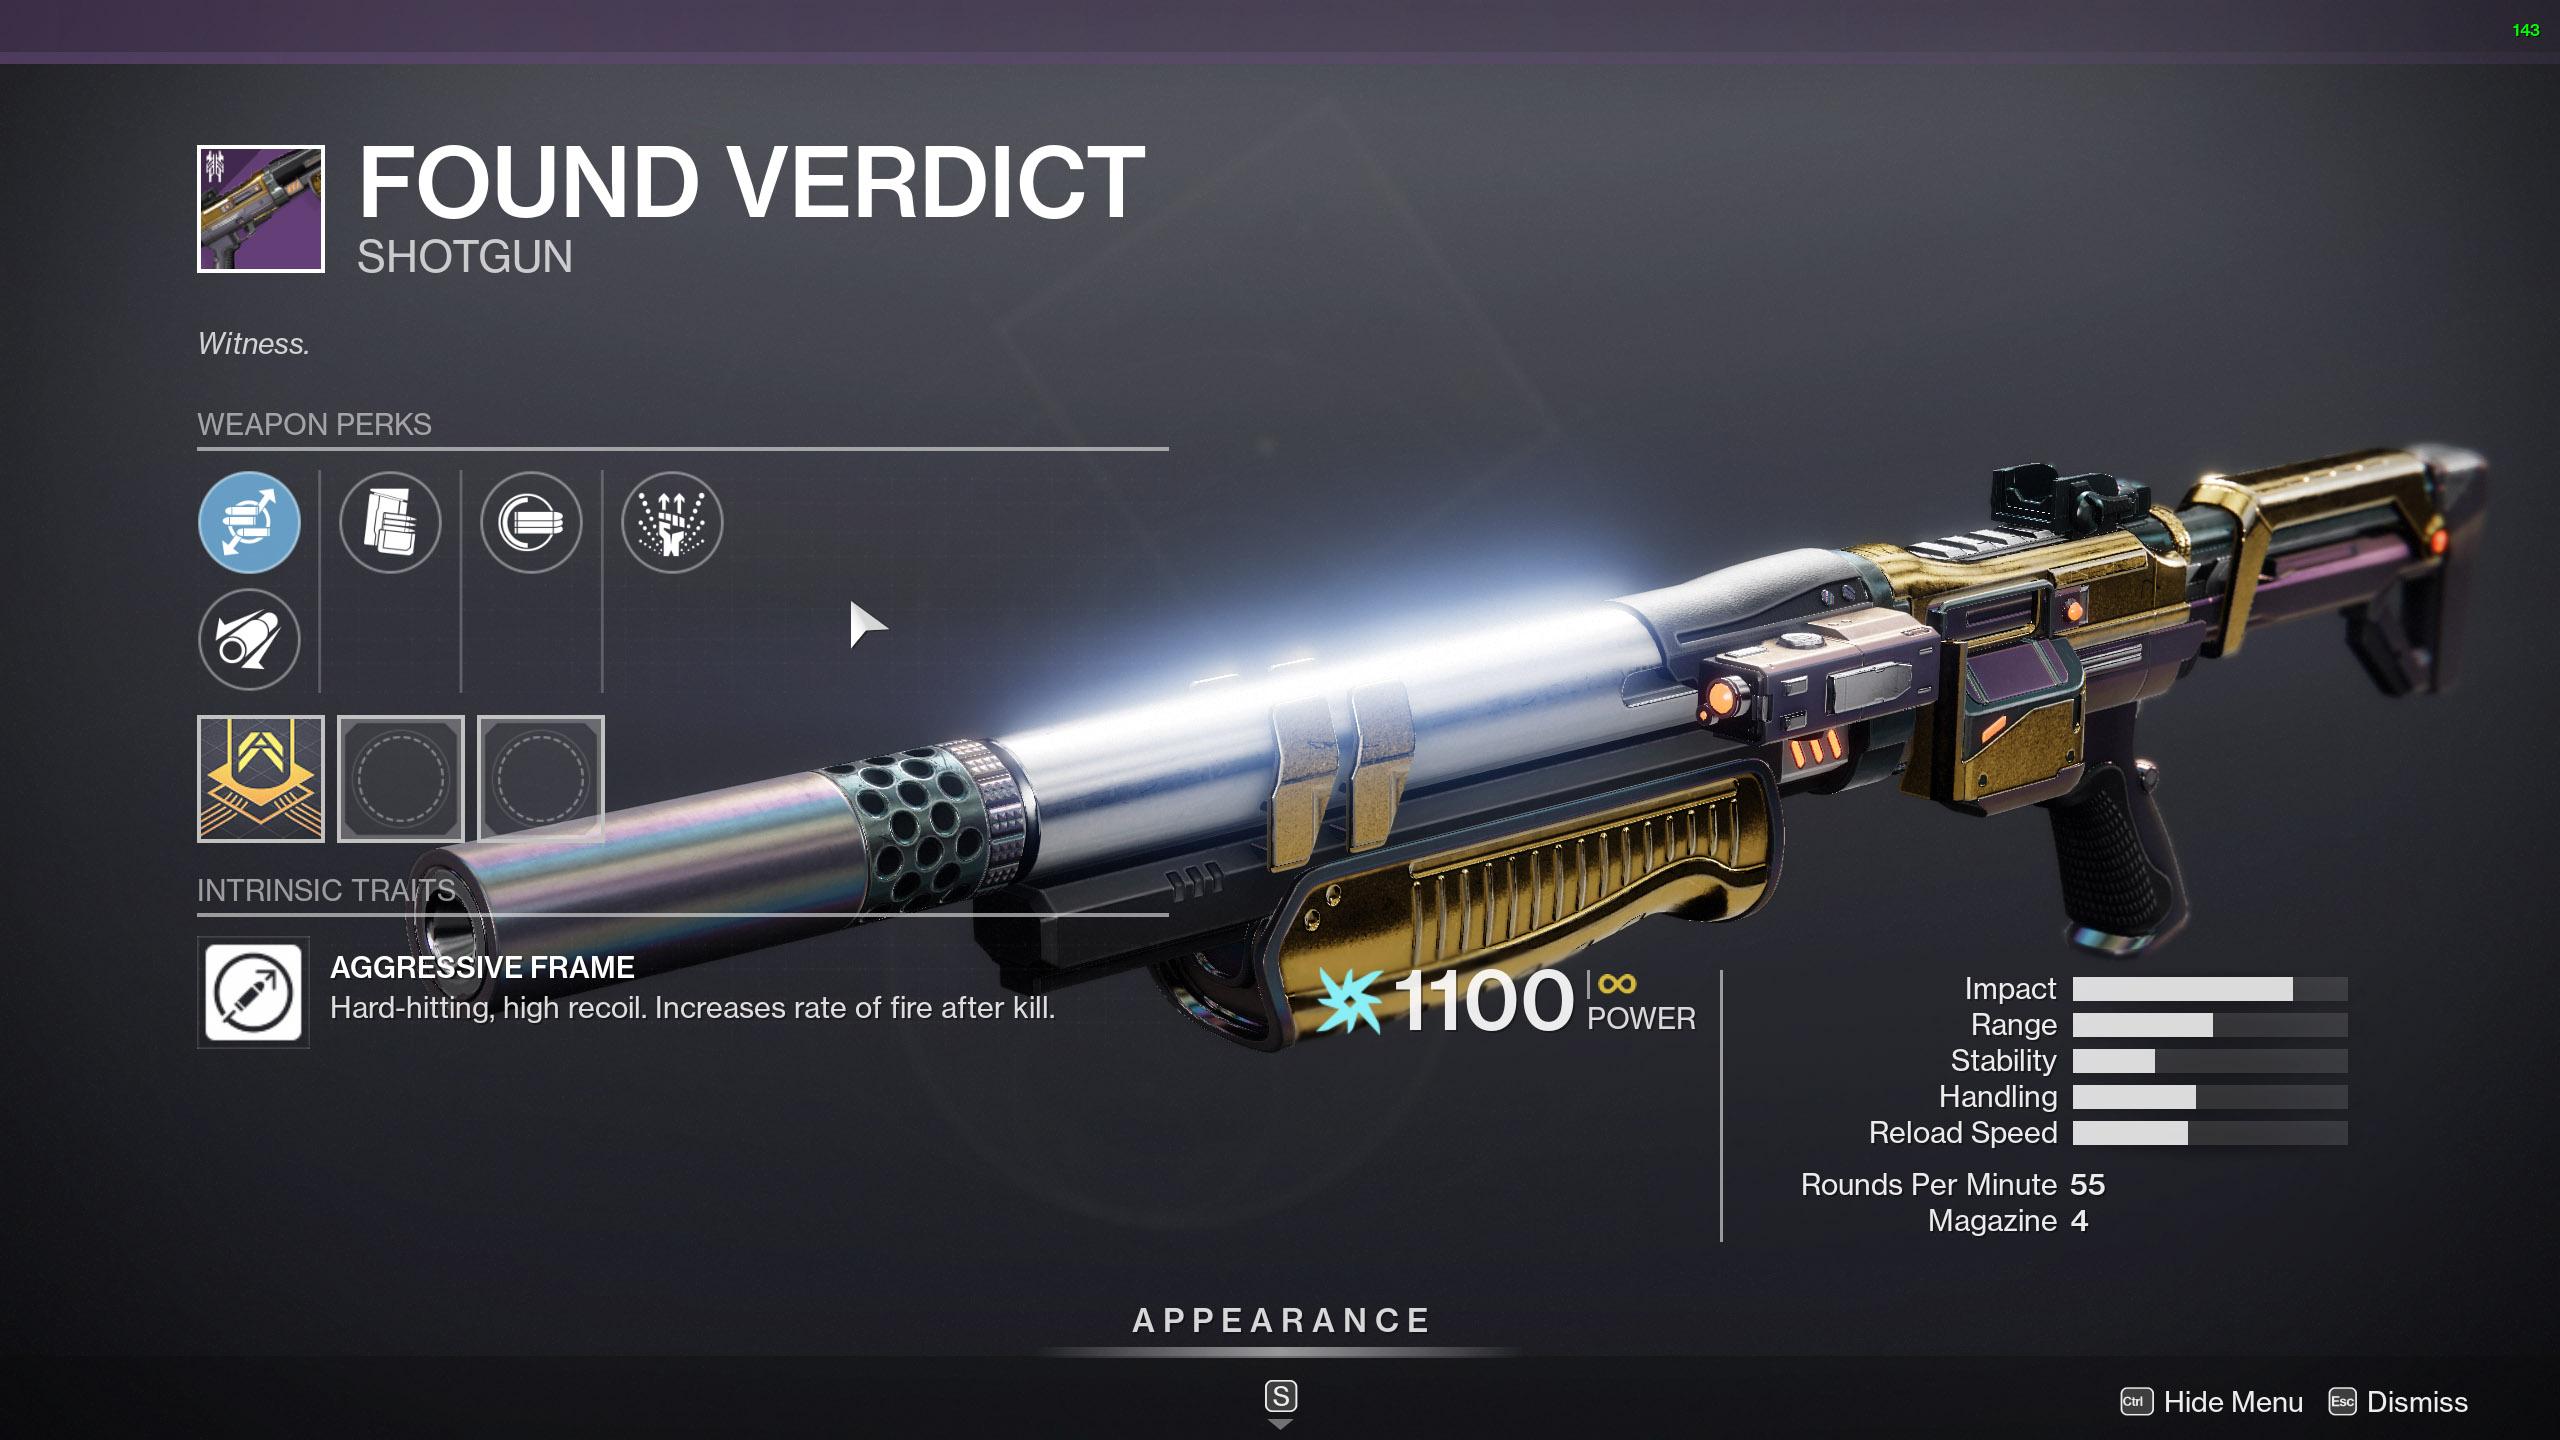 destiny 2 found verdict